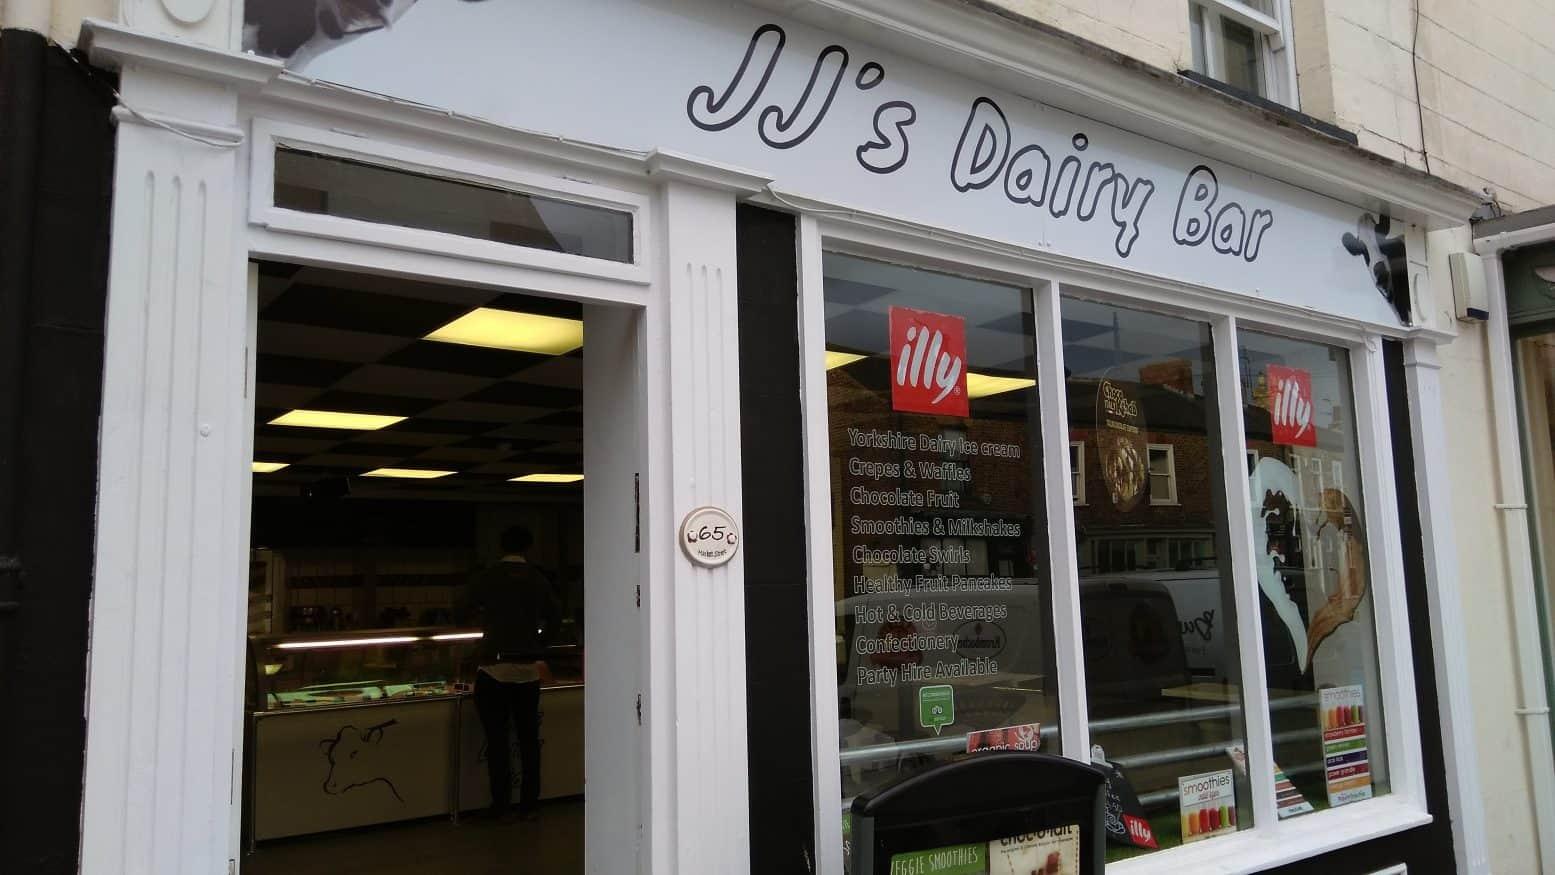 JJ's Dairy Bar – New Ice Cream Bar in Pocklington